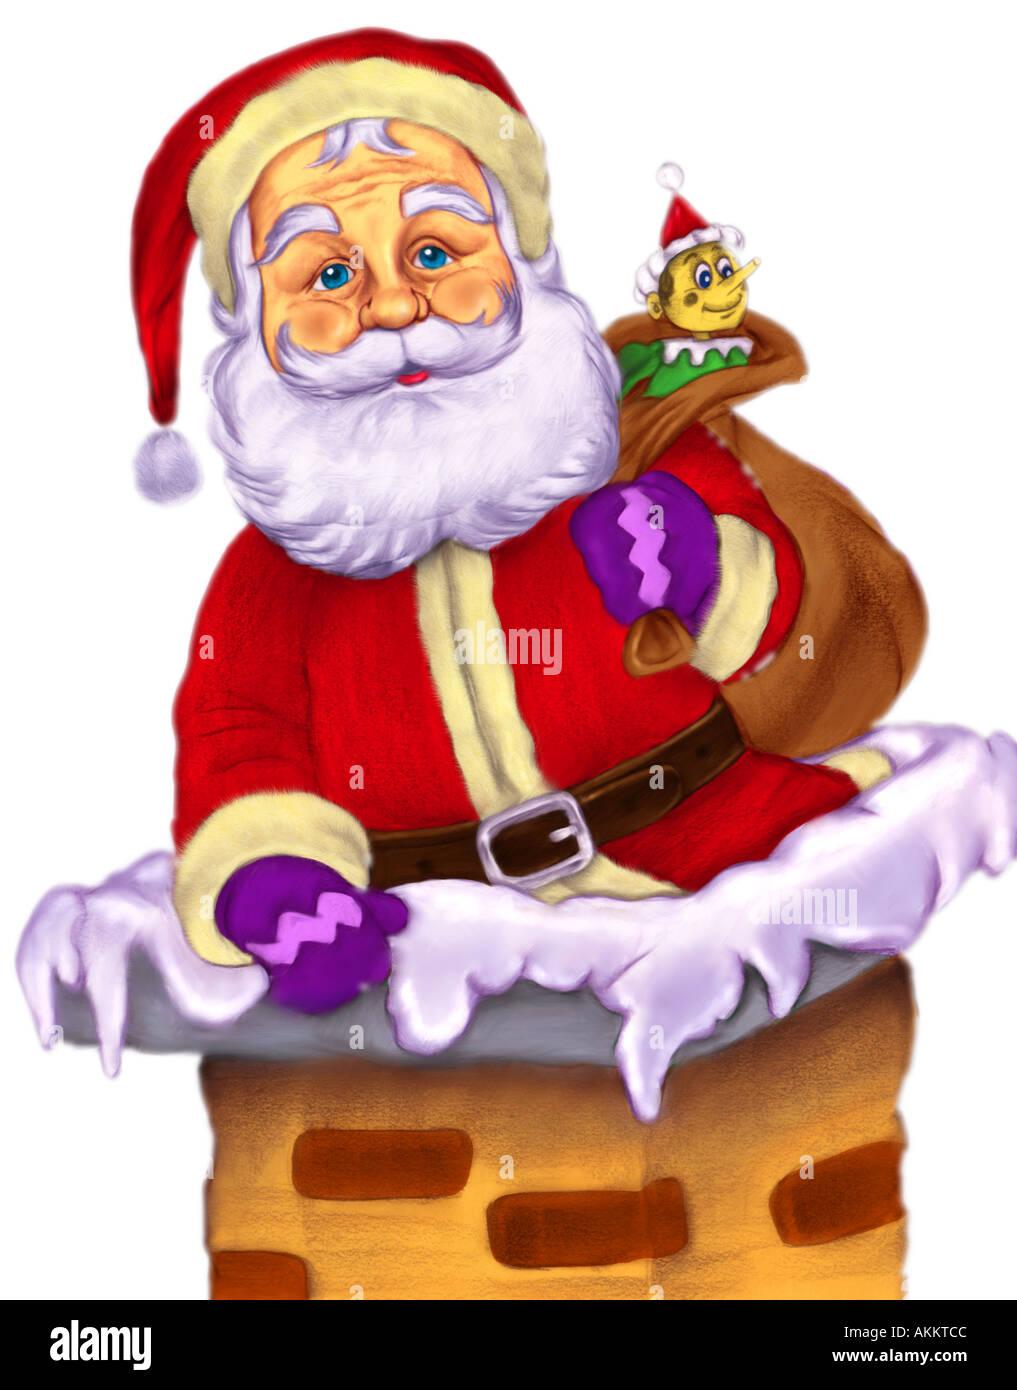 christmas illustration of santa climbing down a chimney stock photo